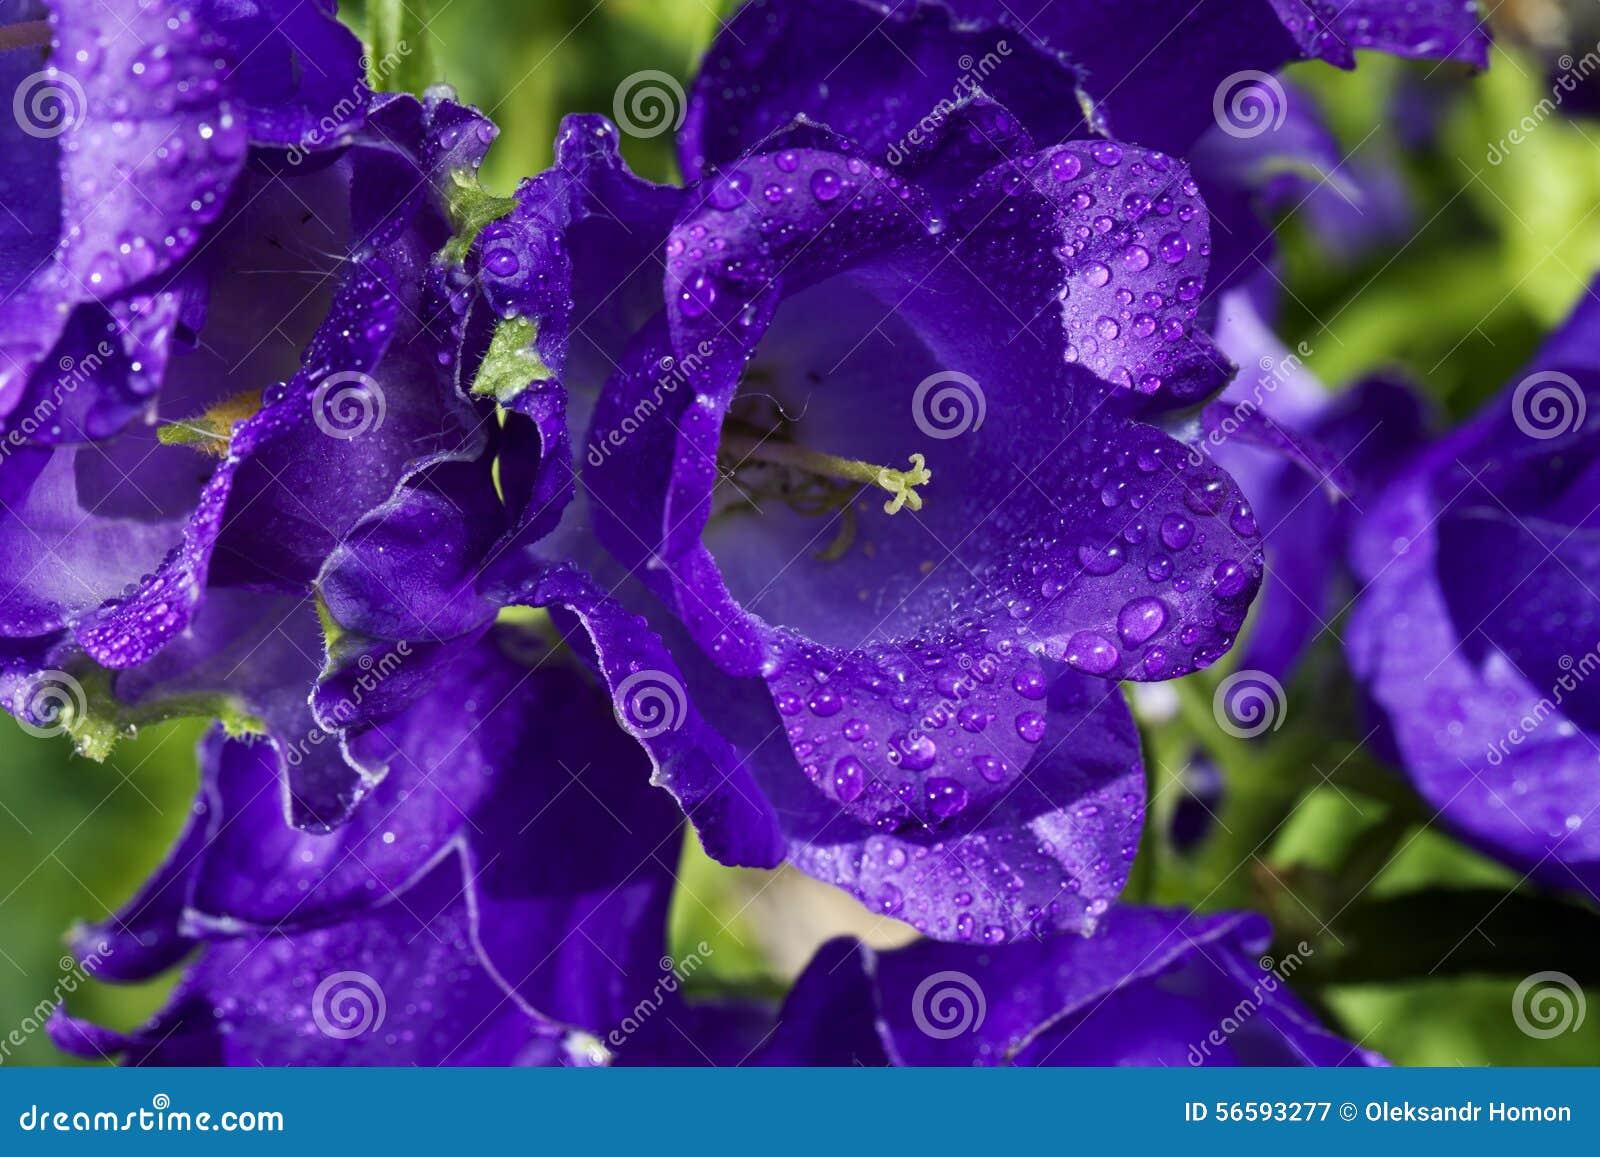 Purple Bell Flowers Stock Photo 56593277 Megapixl